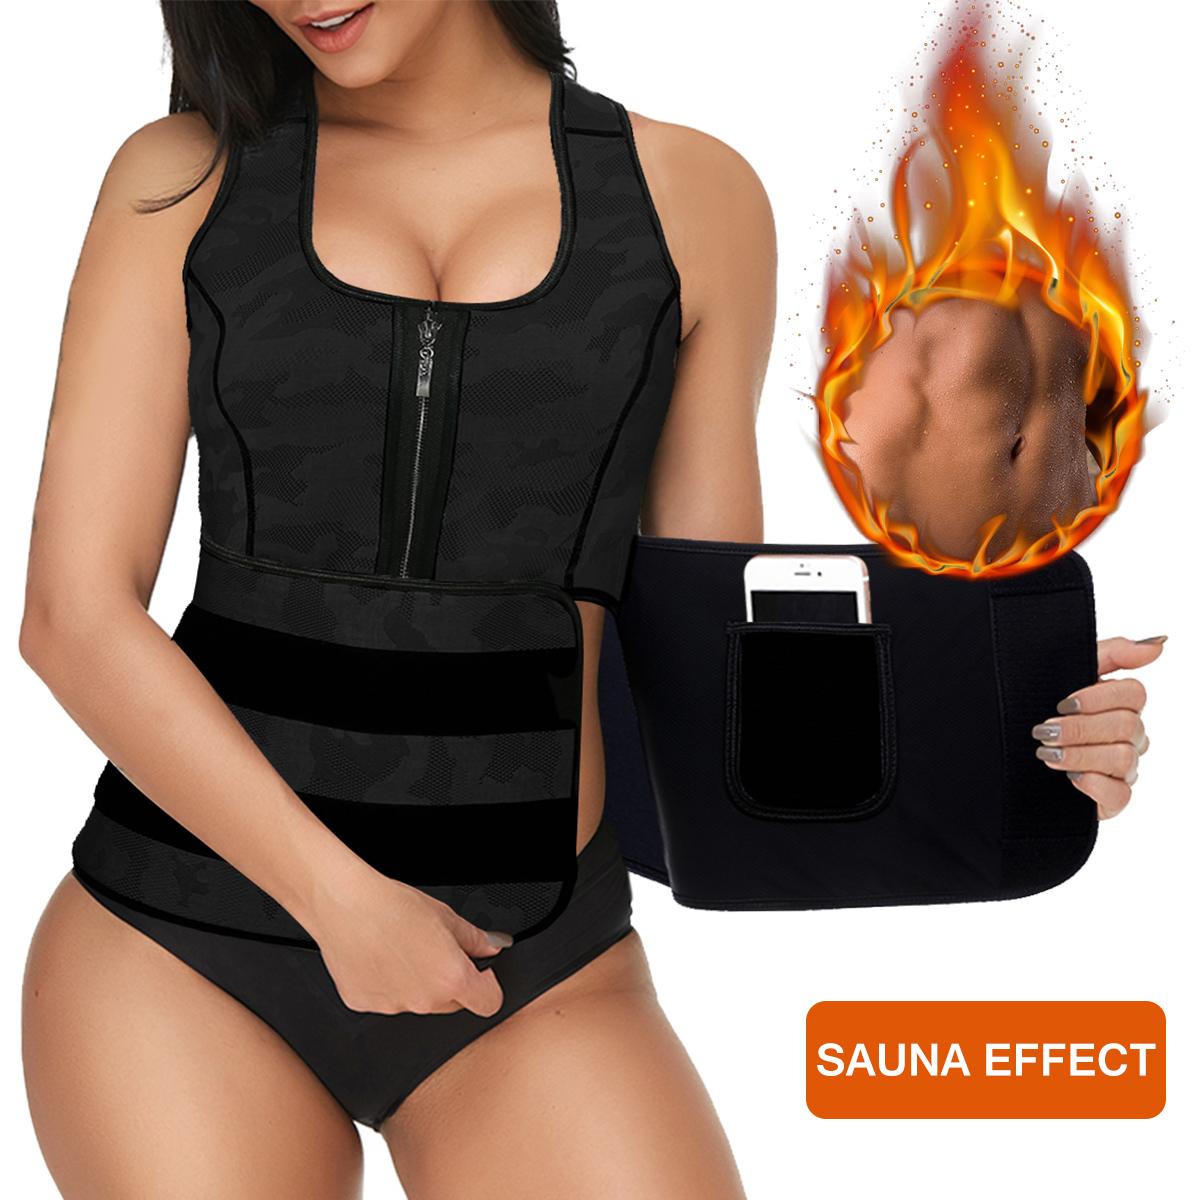 Women Sweat Sauna Suit Body Shaper Men Vest Thermo Neoprene Trainer Sliming Waist Belt Tracksuit Black